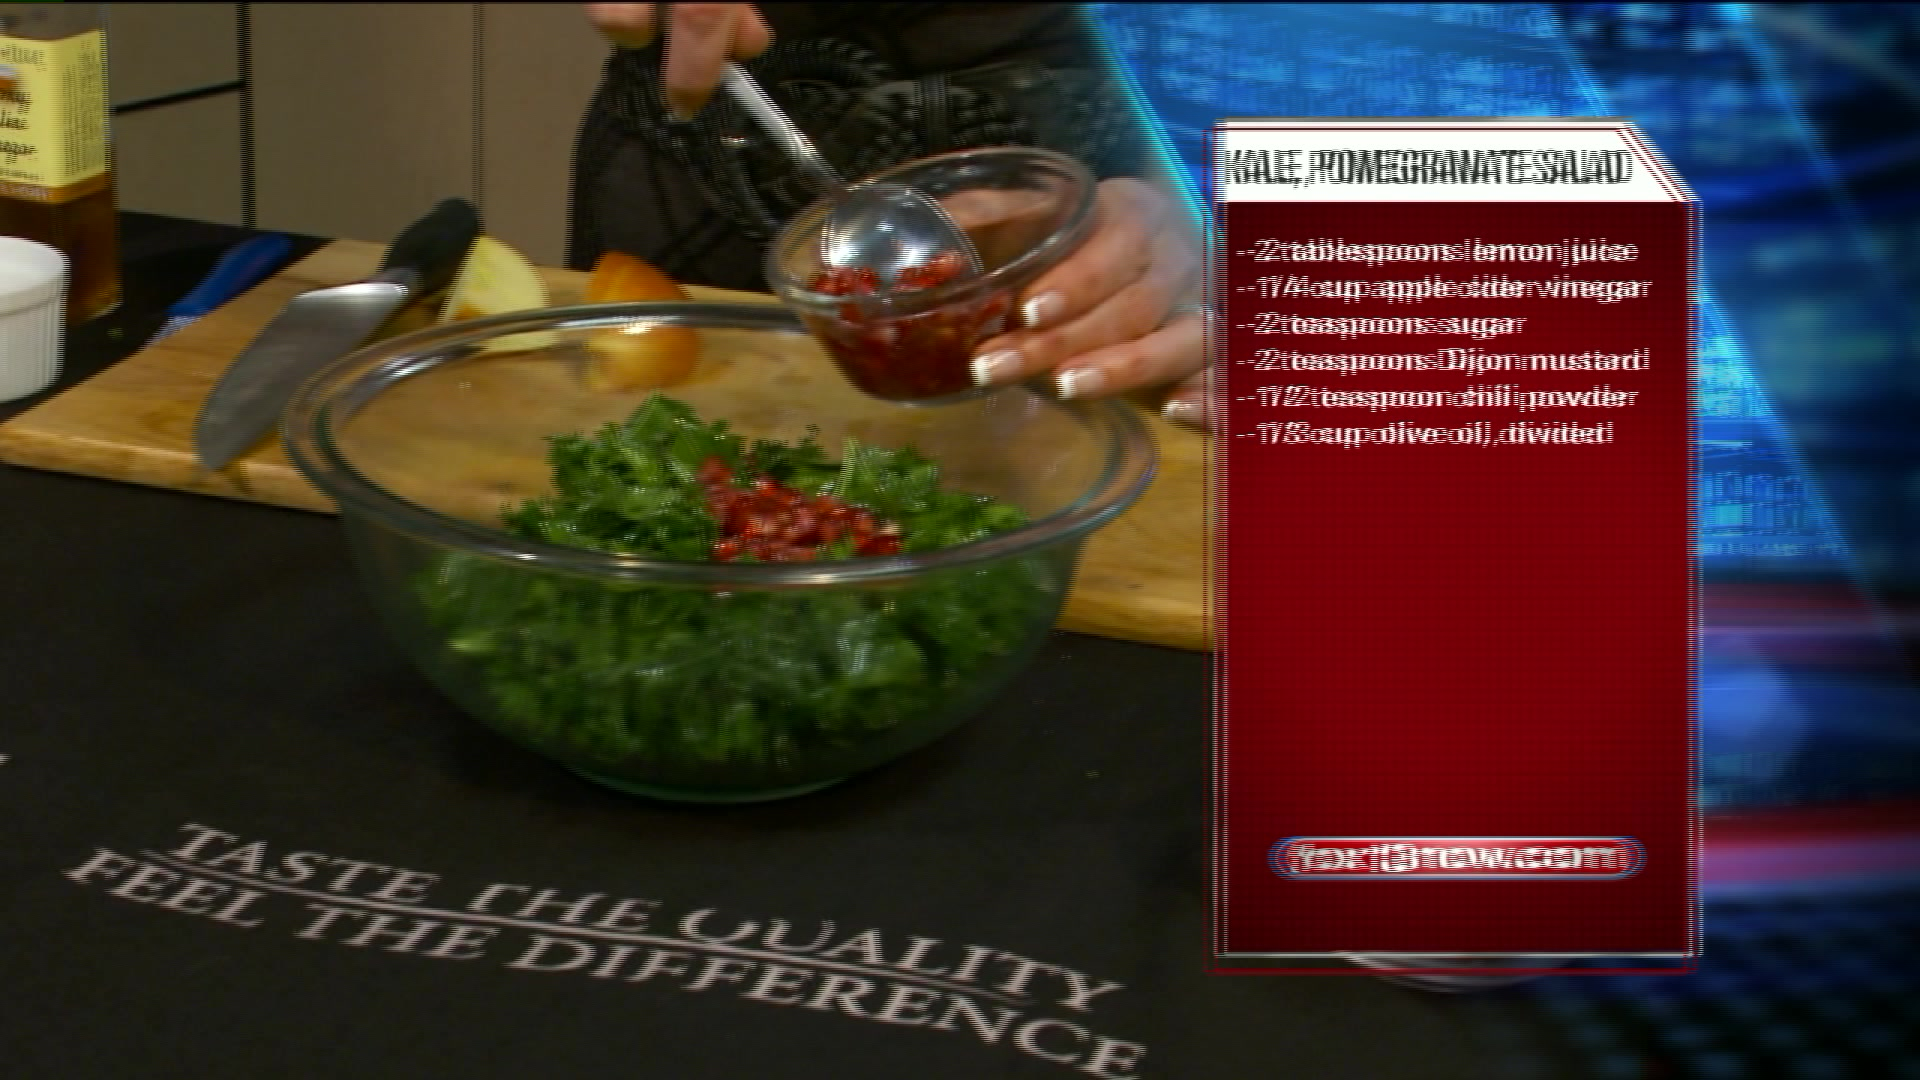 How To Make Kale & Pomegranate Salad